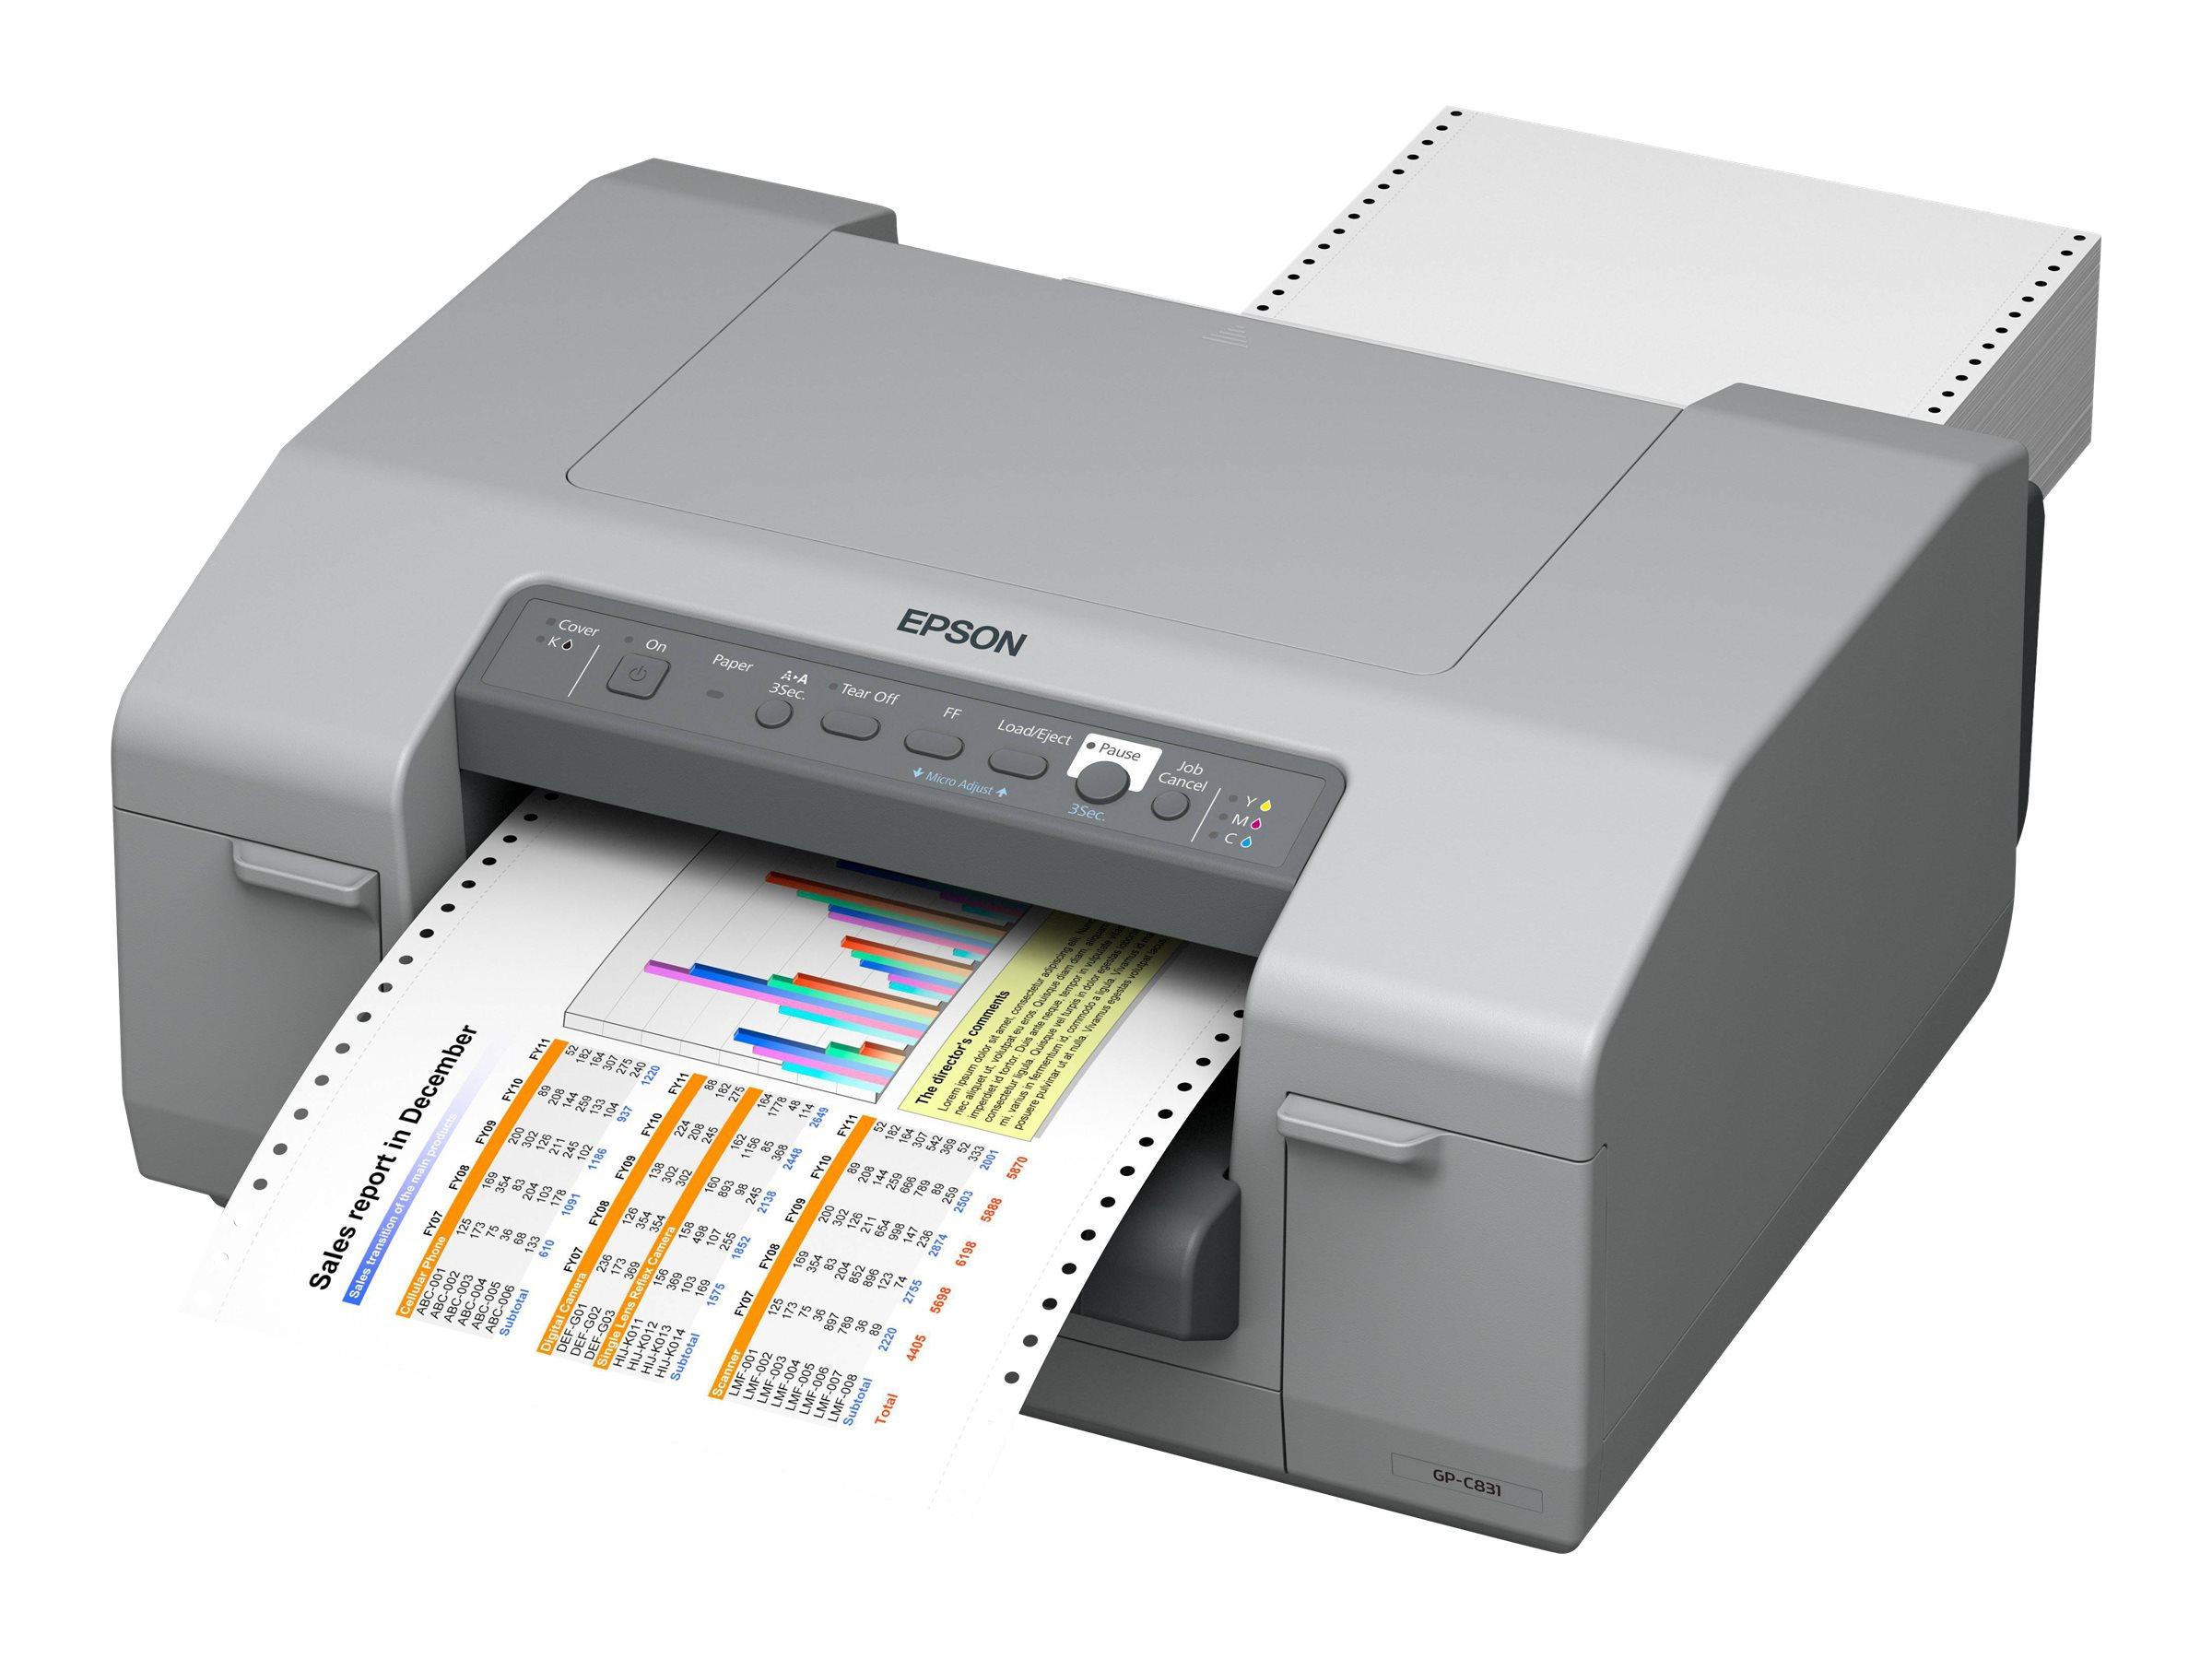 Epson GP-C831 - Etikettendrucker - Farbe - Tintenstrahl - 241 mm (Breite) - 5760 x 1440 dpi